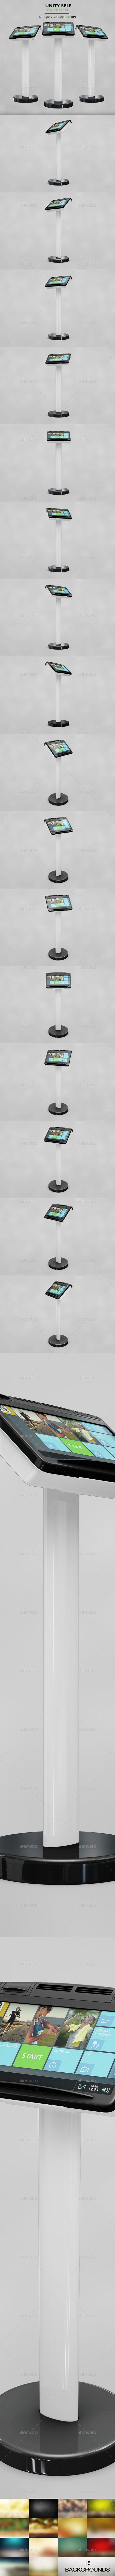 Stand Gym Screen MockUp - Product Mock-Ups Graphics